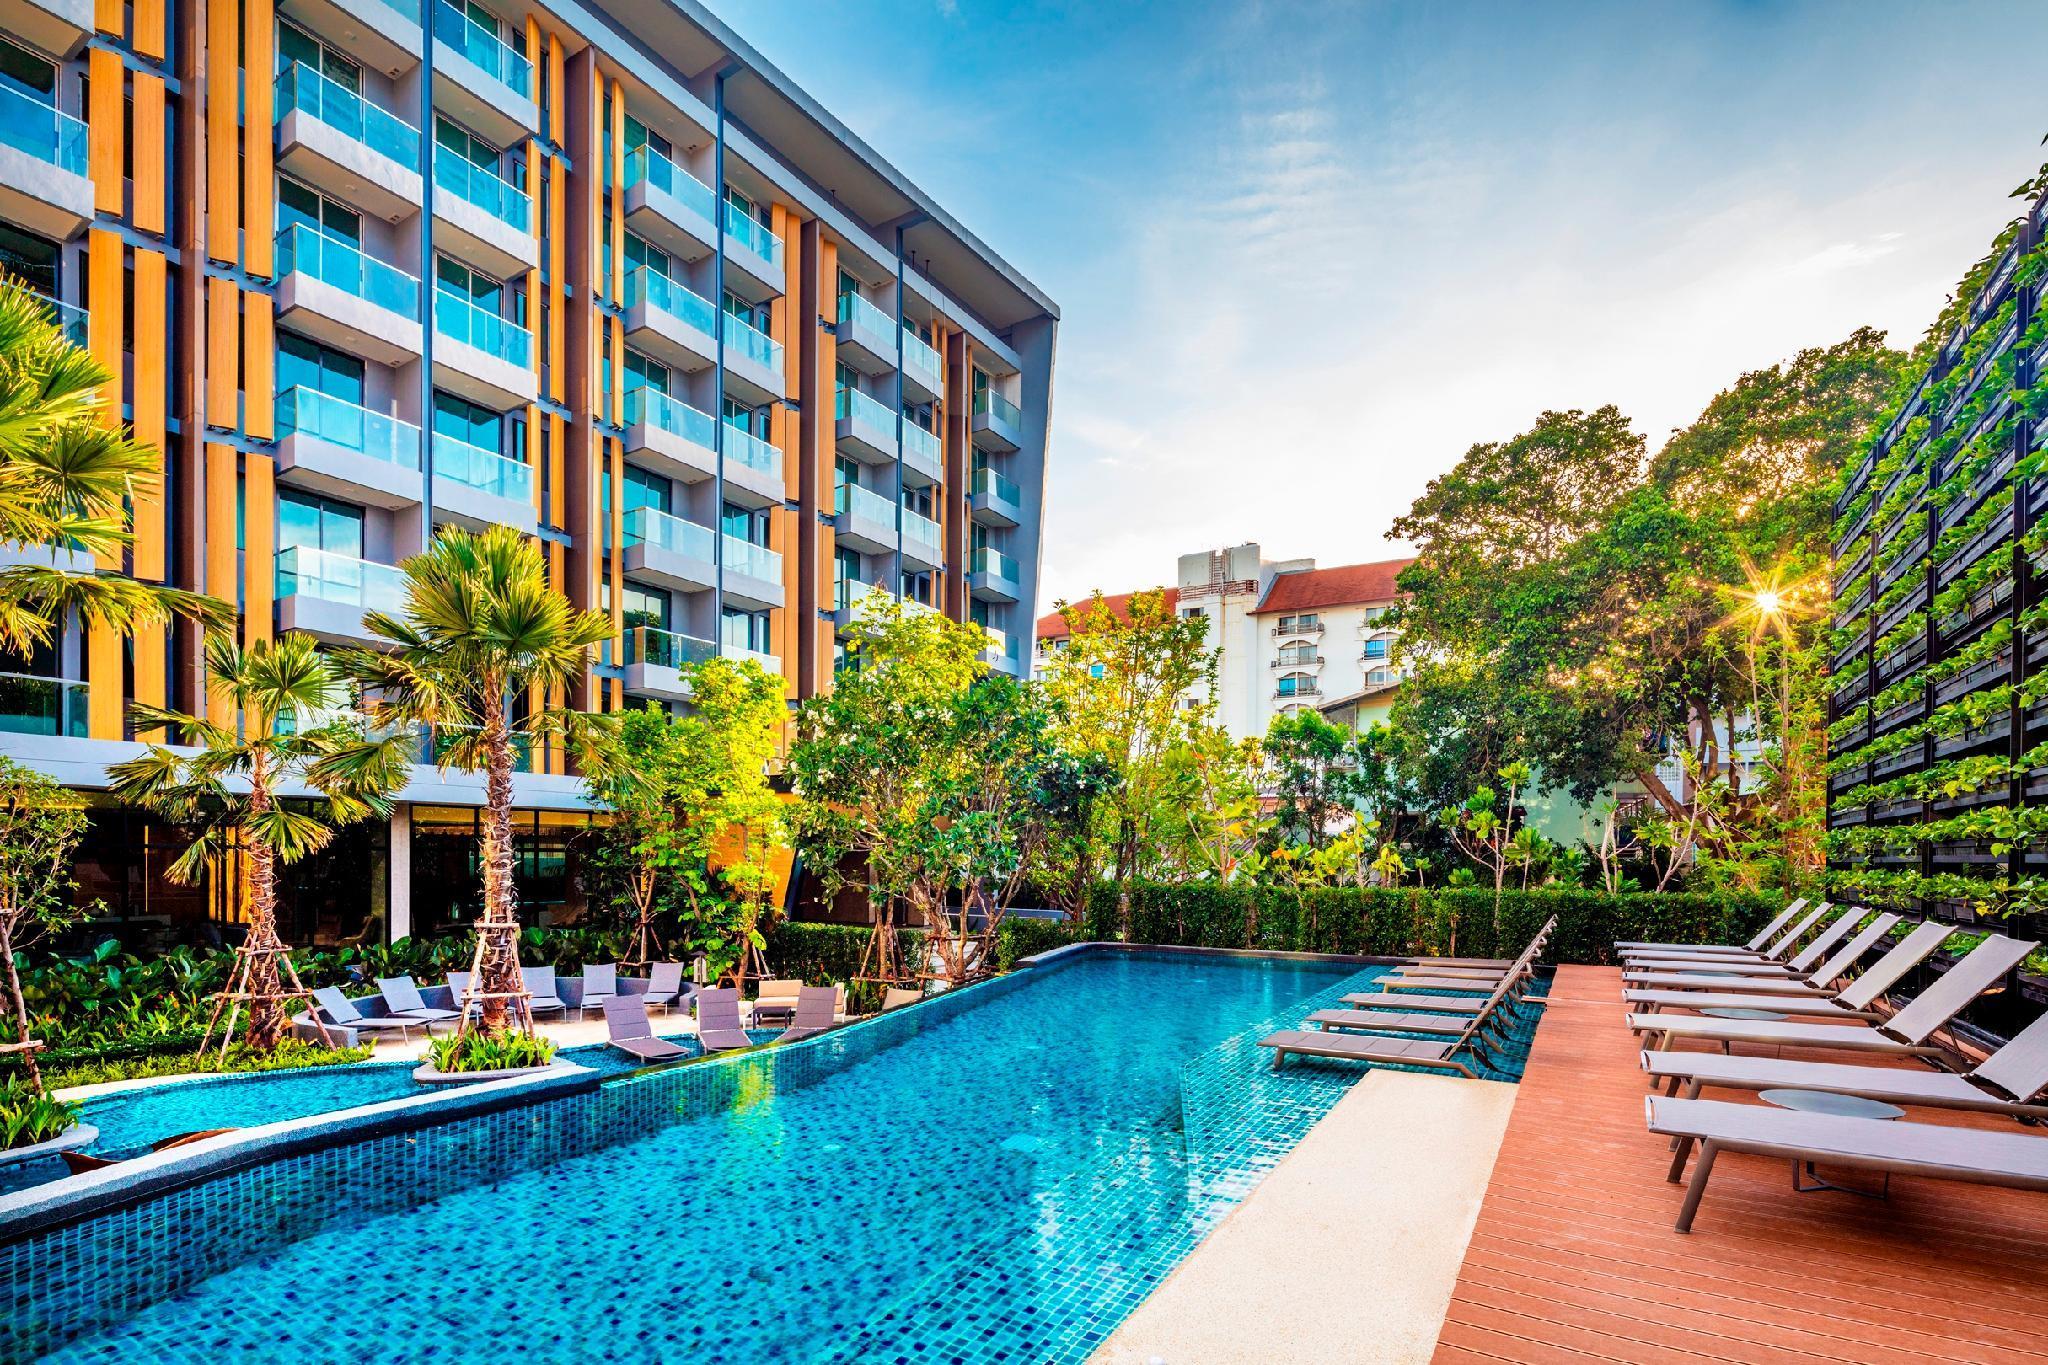 Hotel Amber Pattaya,Chon Buri